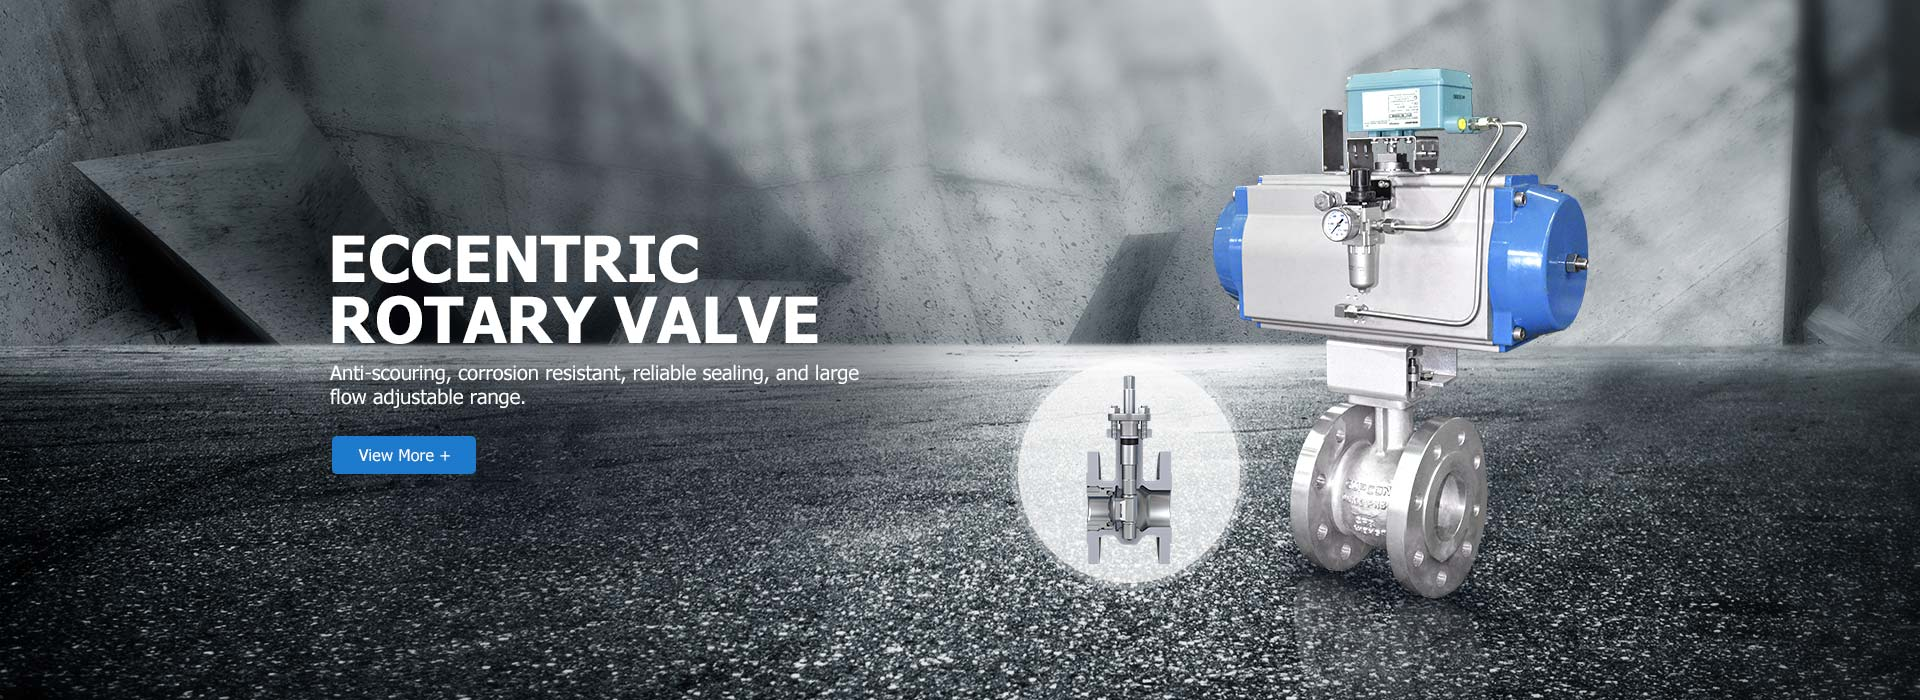 Eccentric rotary valve